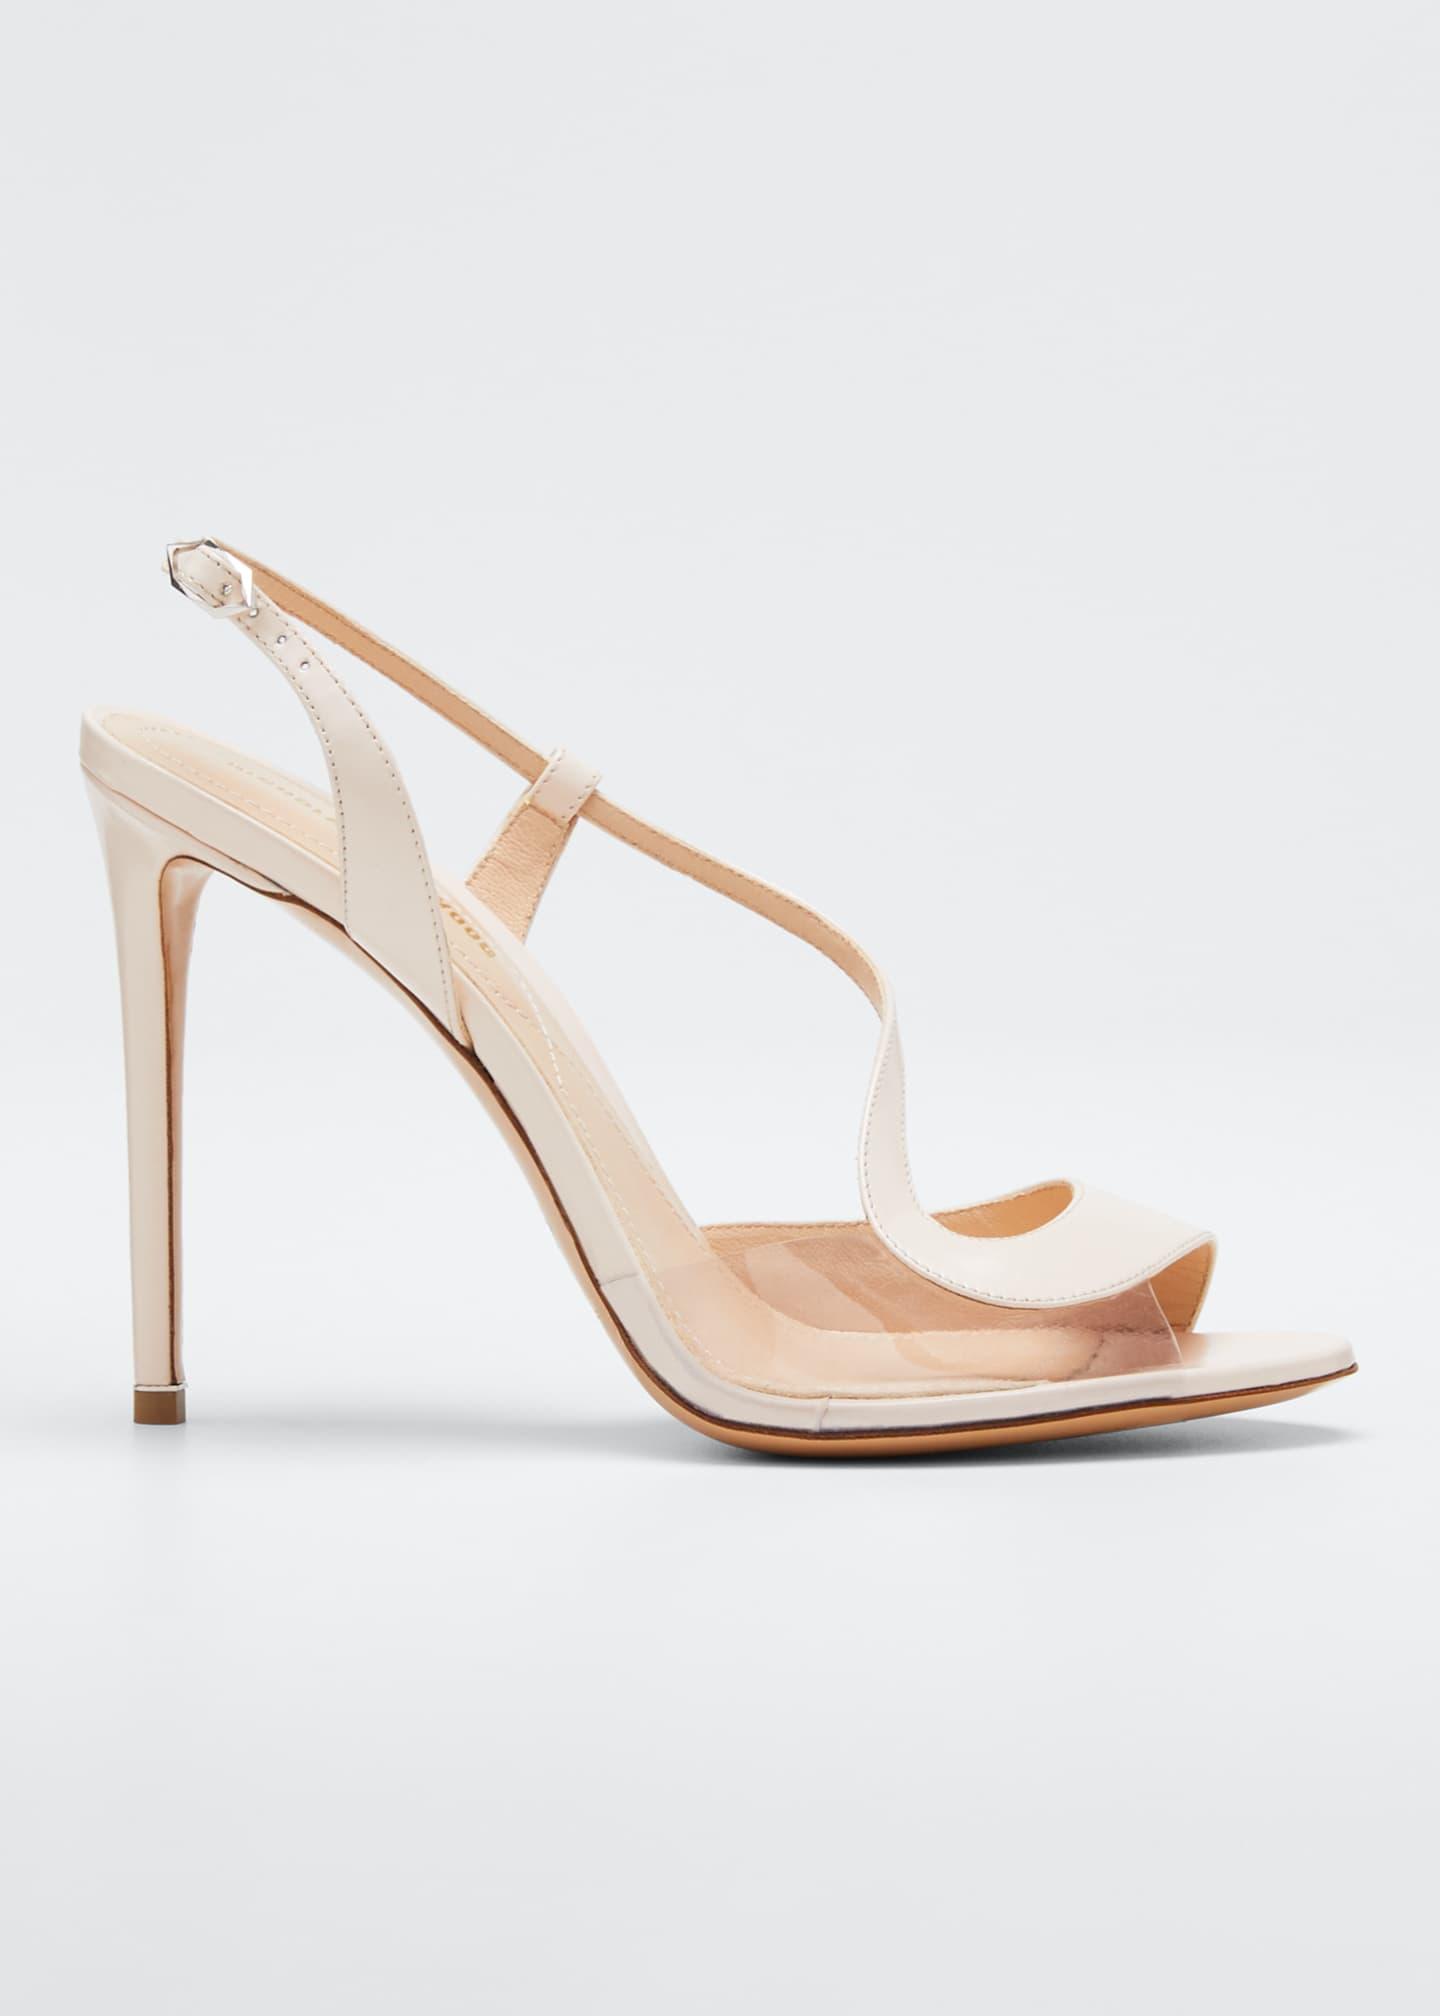 Nicholas Kirkwood Leather and PVC Sandals